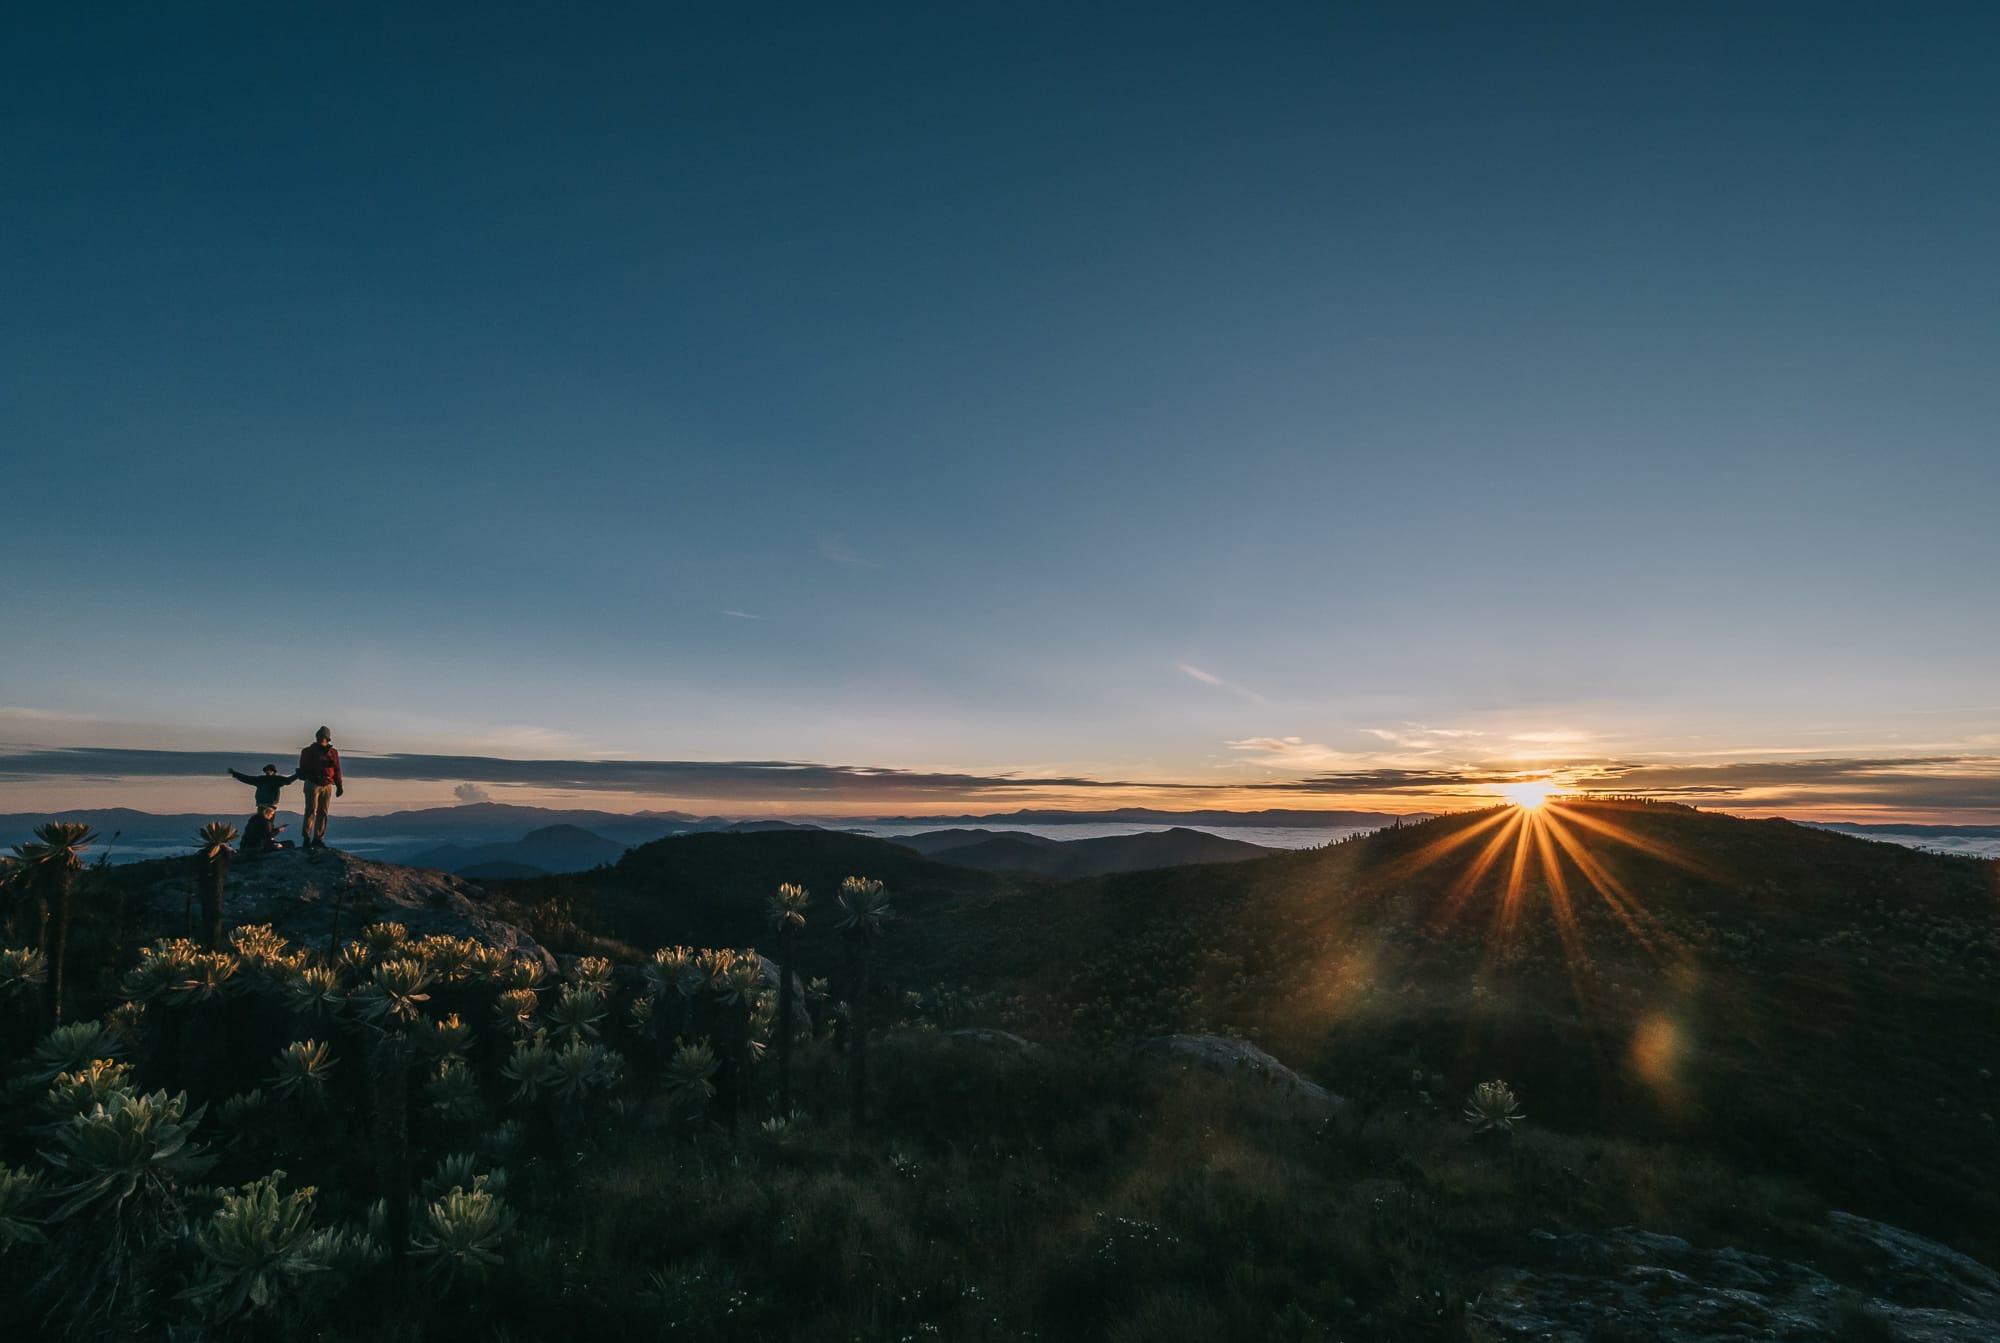 Paramo del sol sunrise